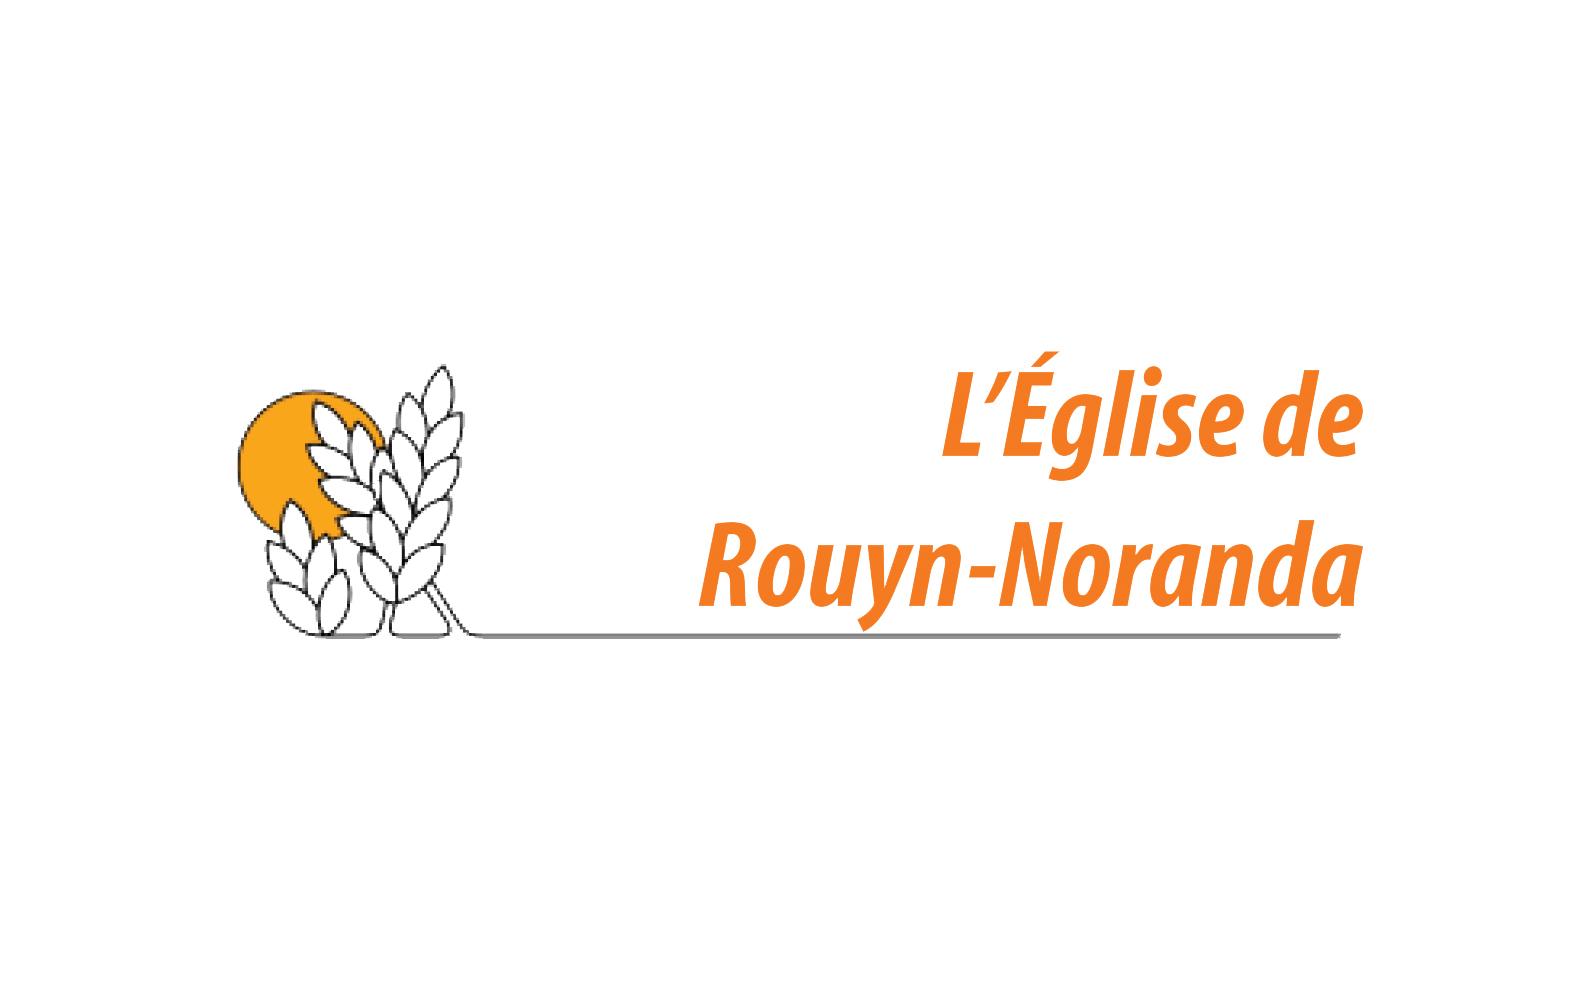 Église de Rouyn-Noranda, L'